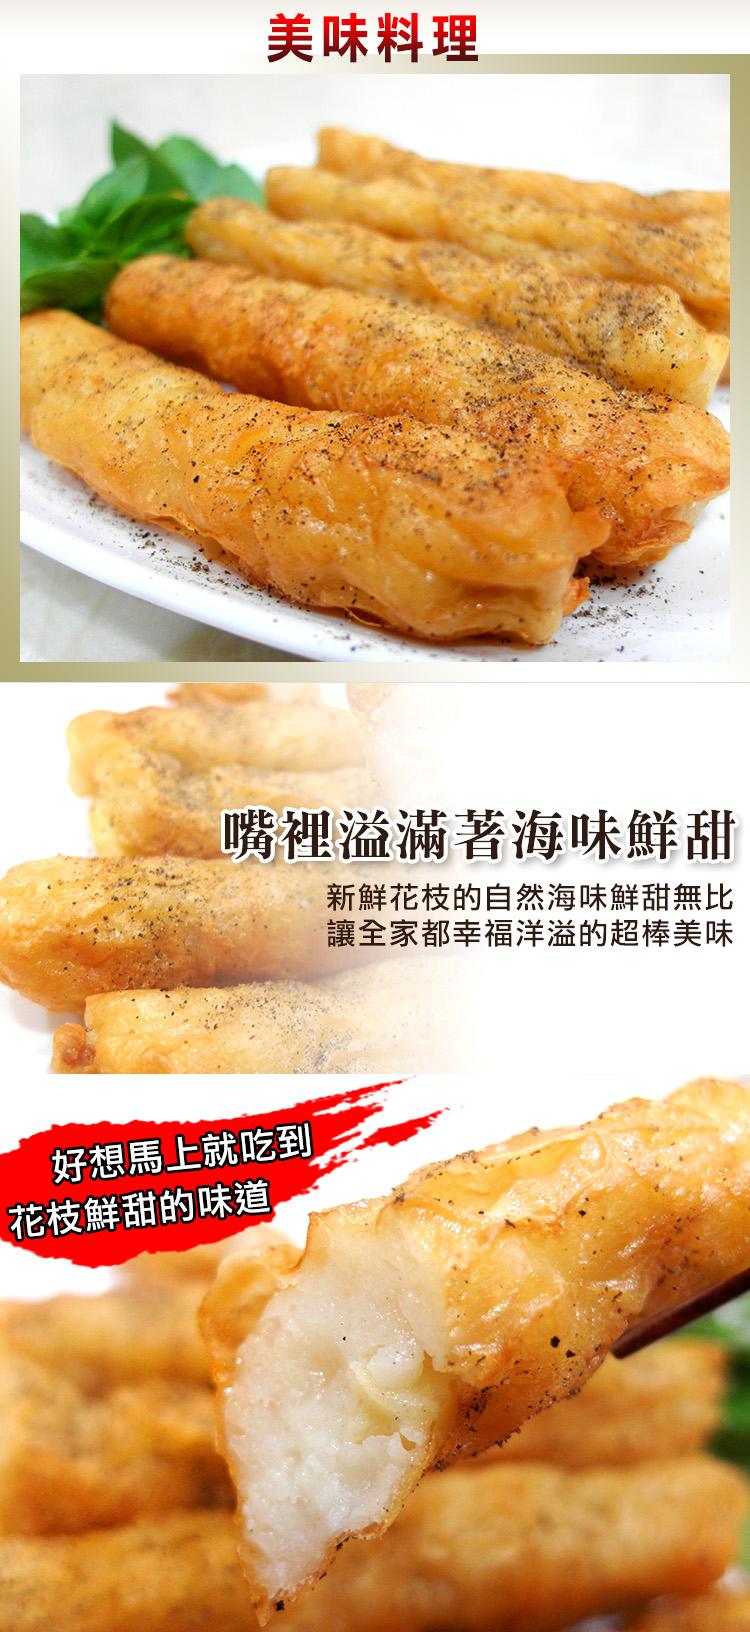 squidroll10